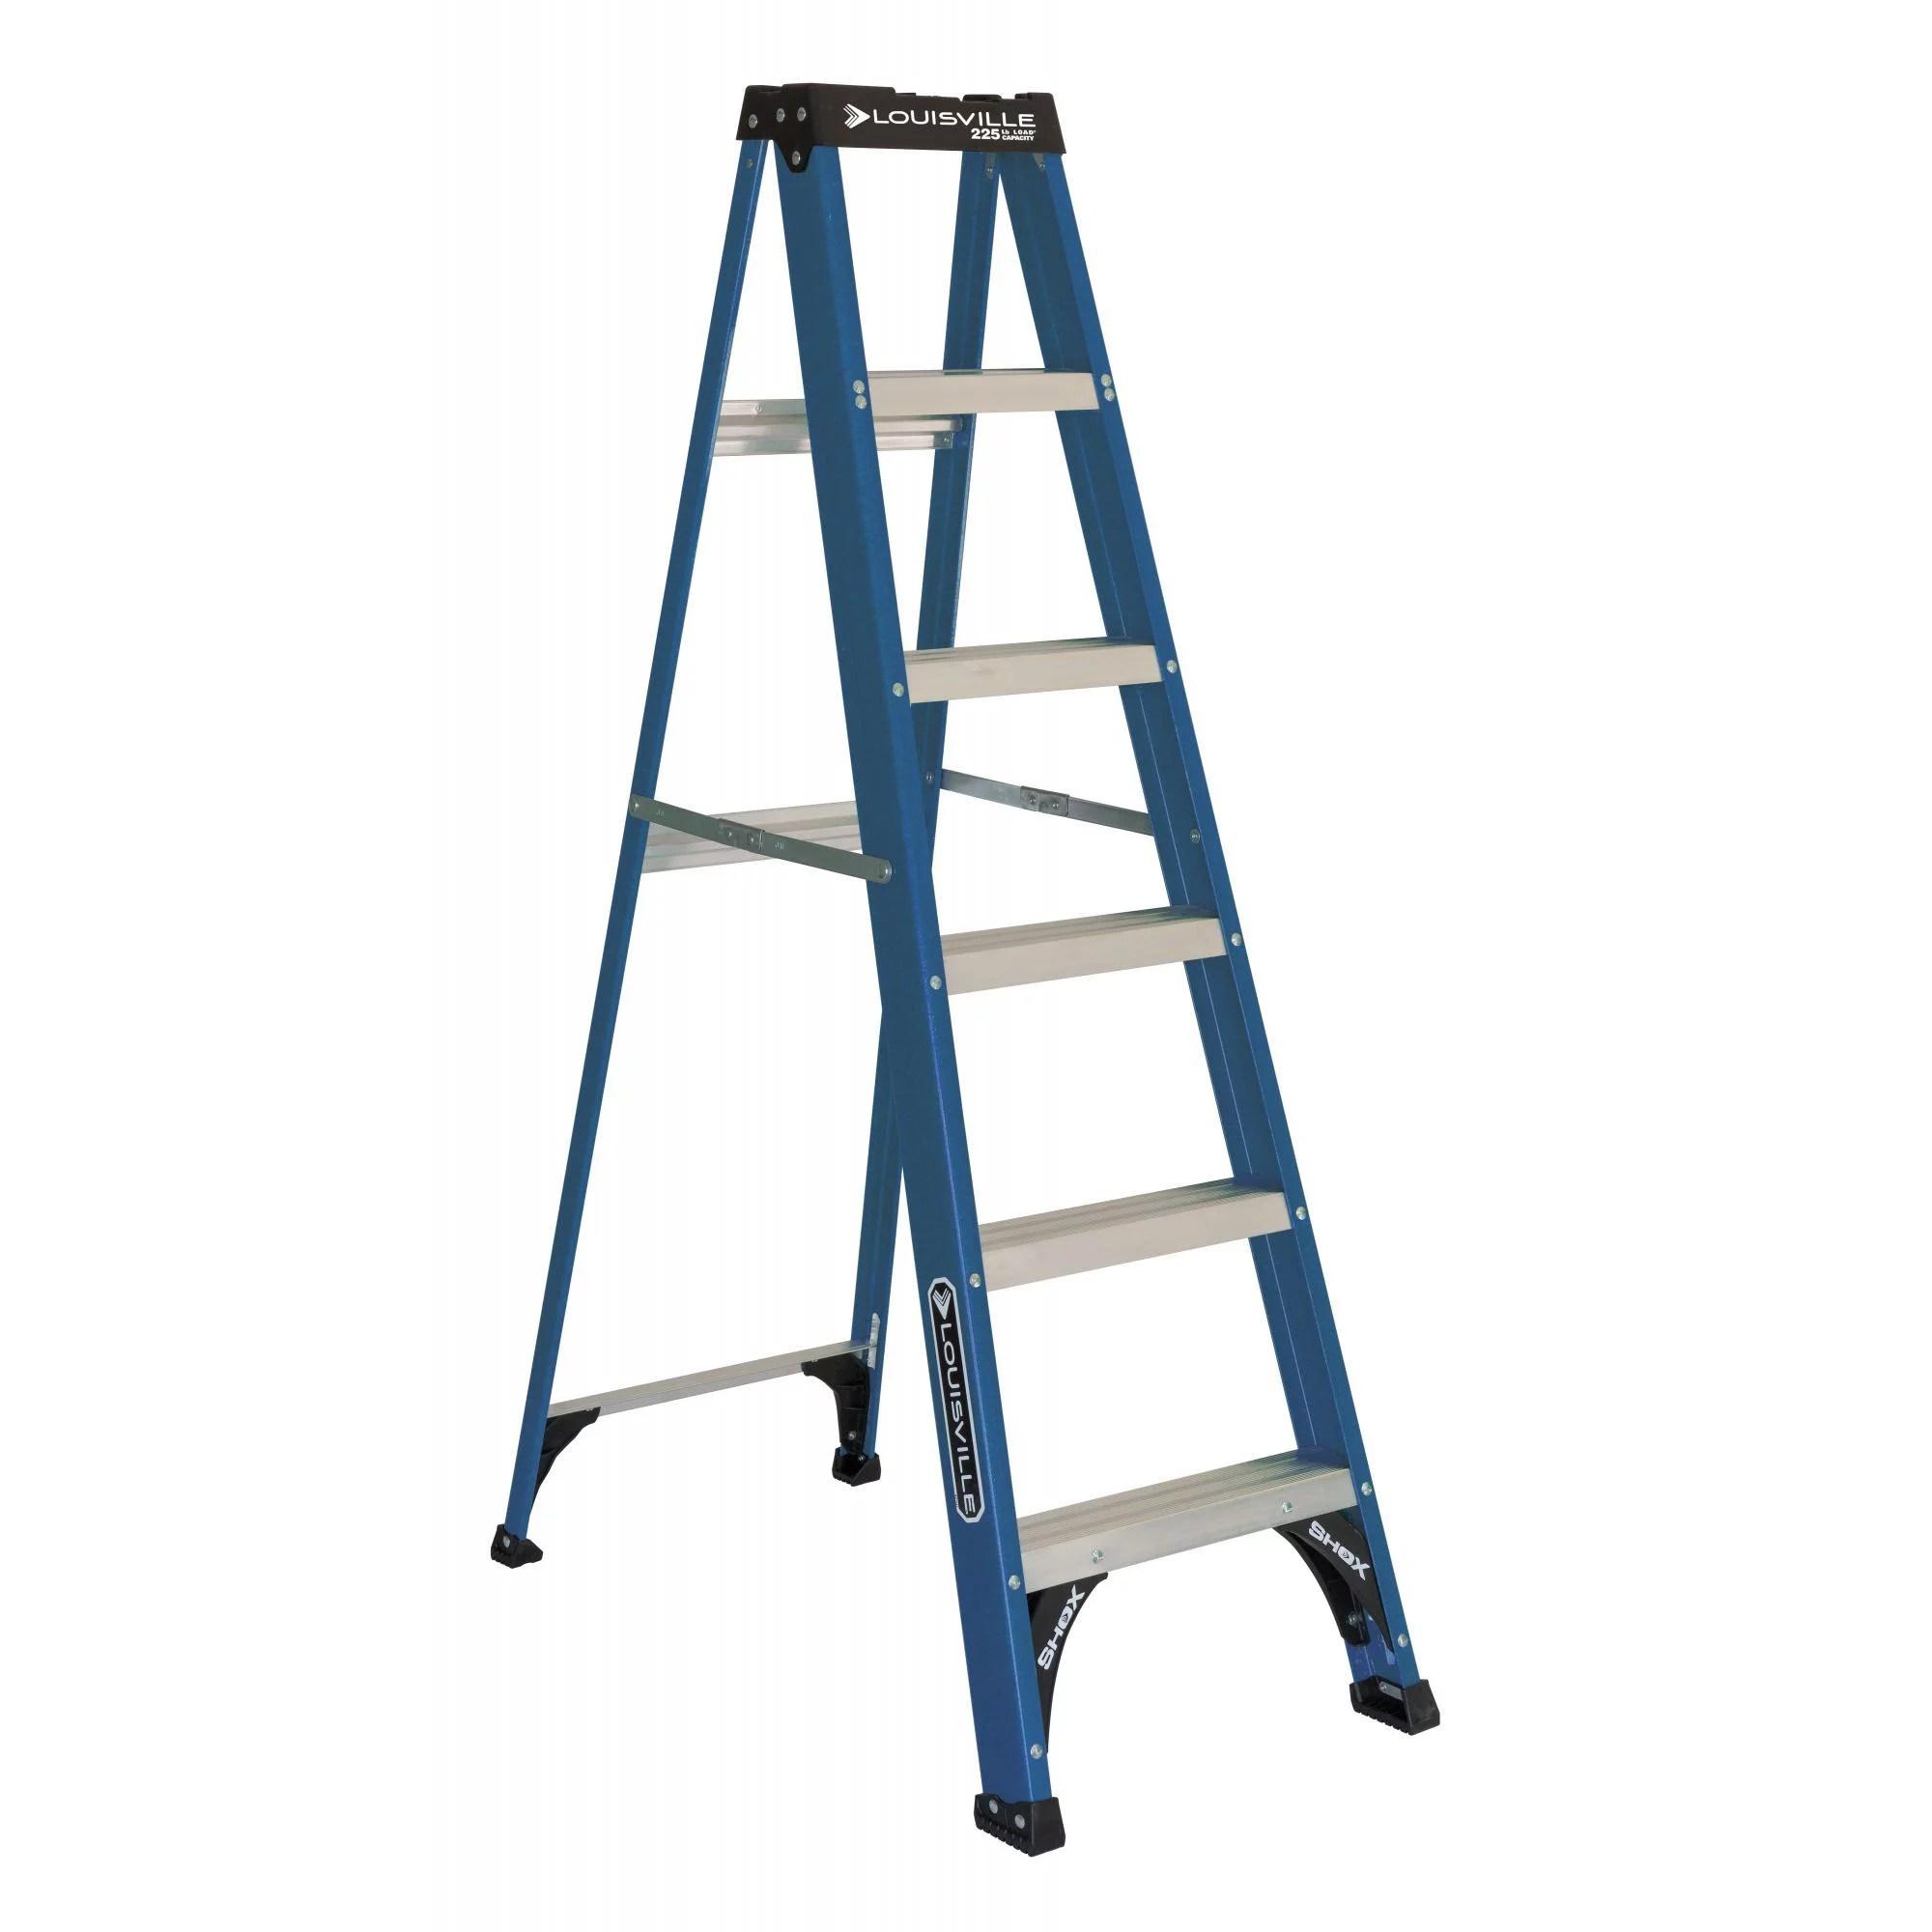 louisville ladder 6 foot